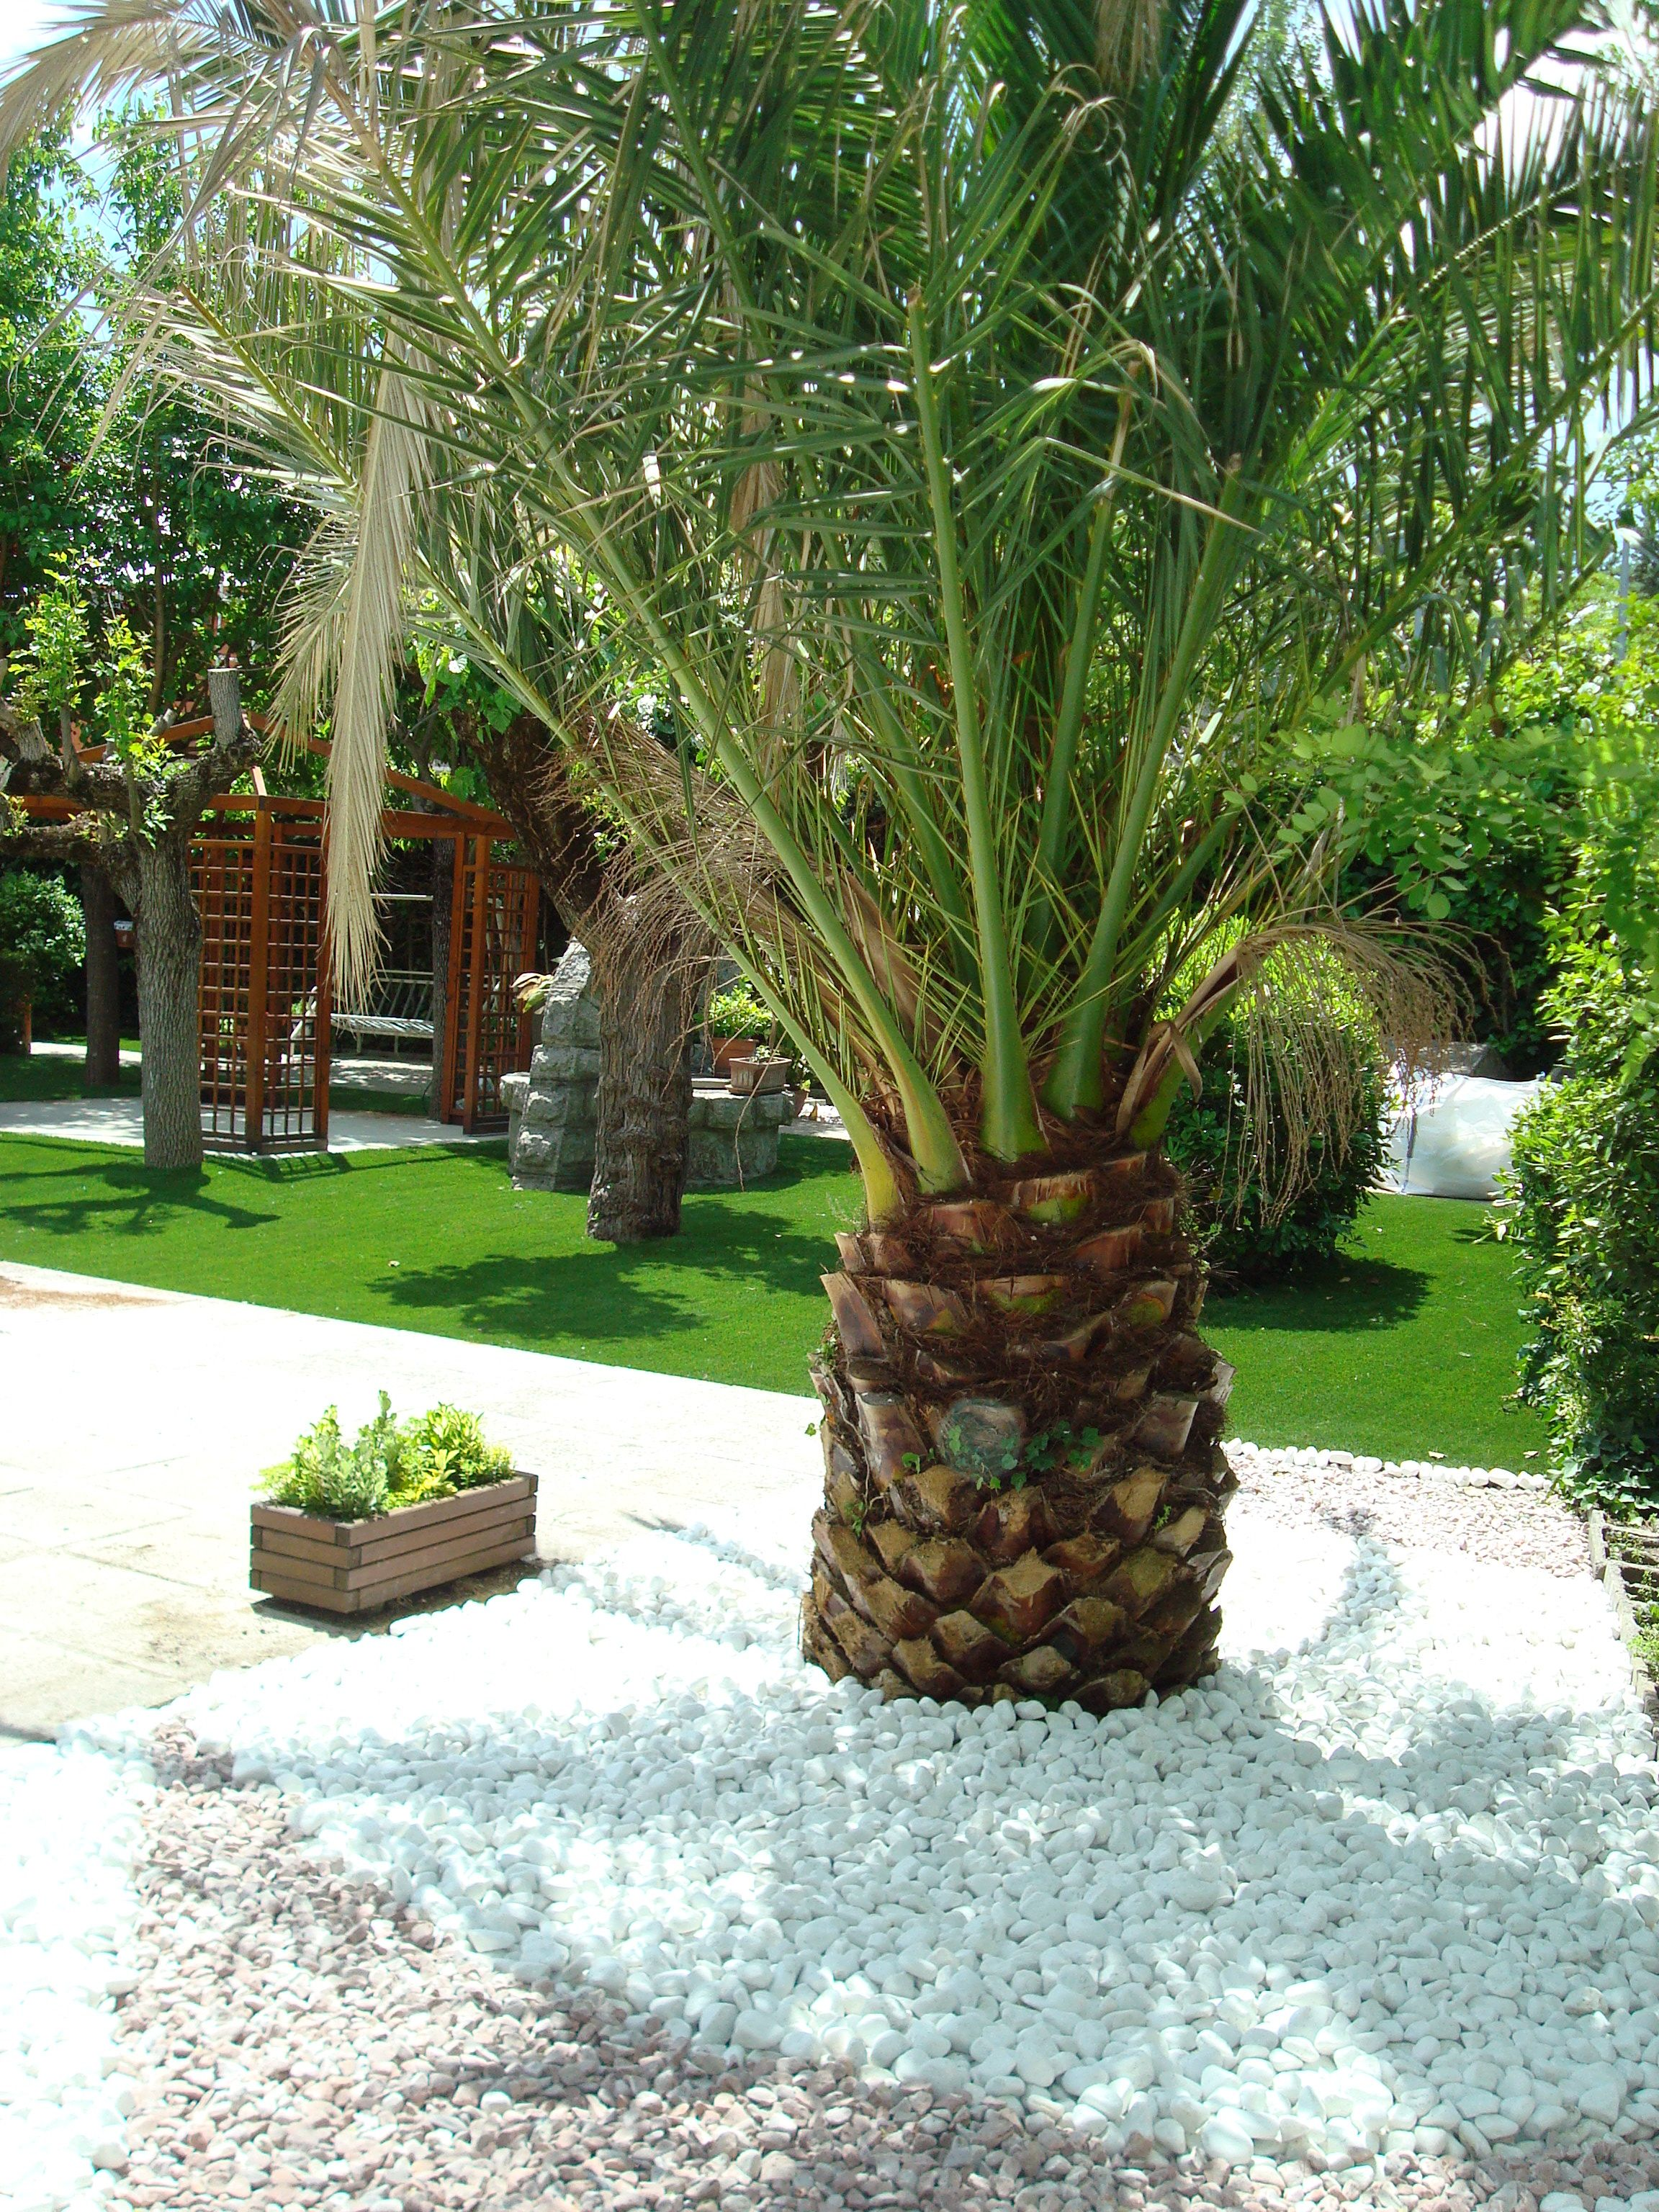 jardin con cesped artificial piedra decorativa alrededor de palmera - Piedra Decorativa Jardin